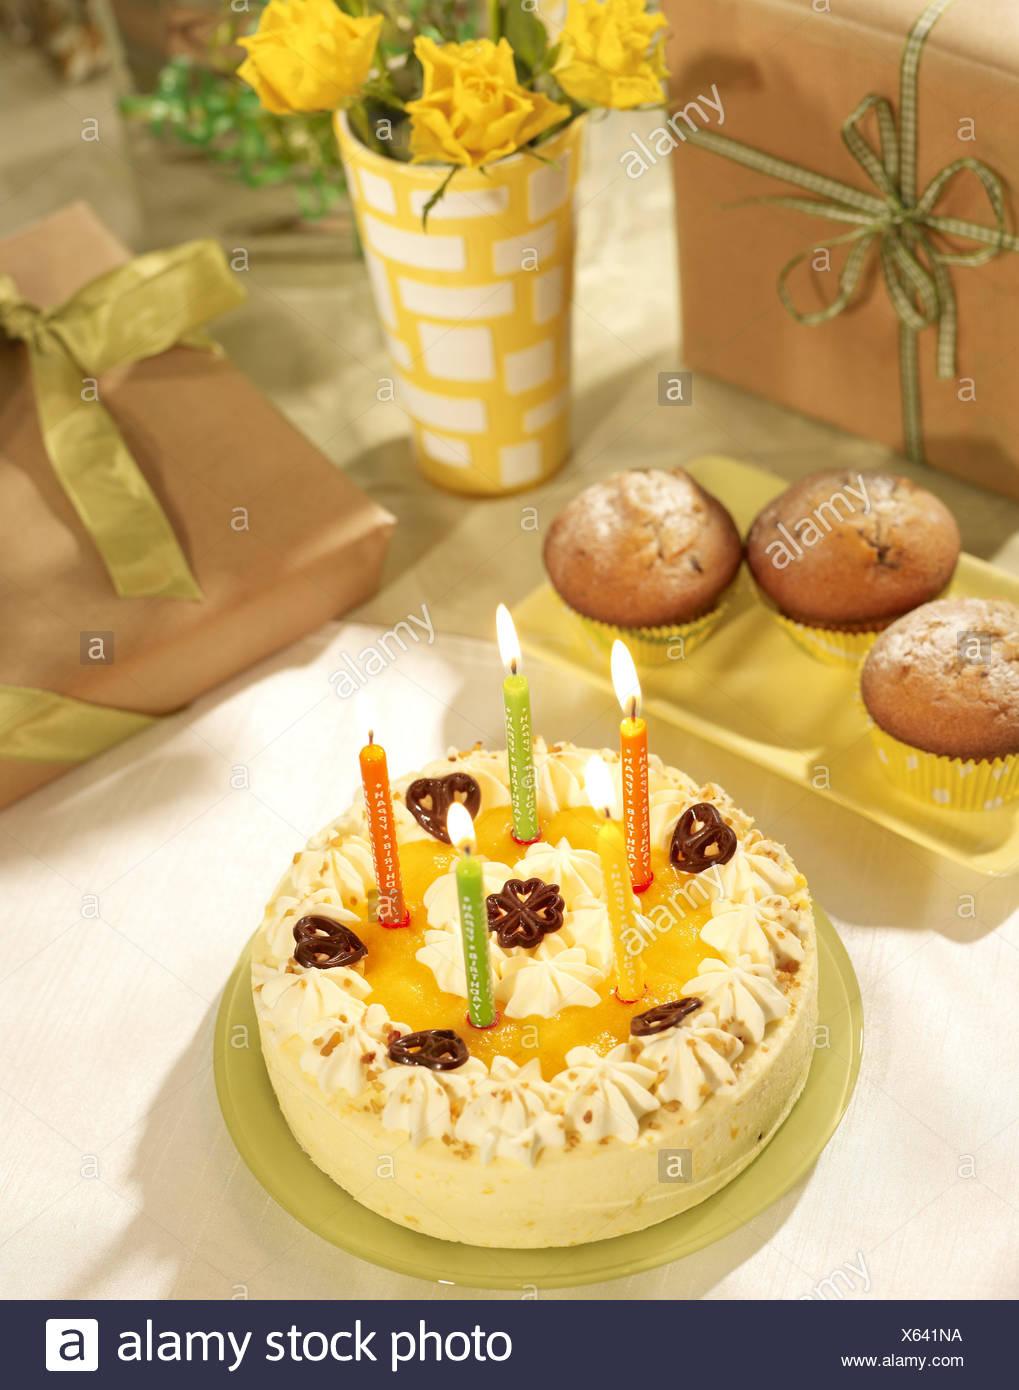 Birthday cake skyers muffin flowers birthday cakes cakes cake birthday cake skyers muffin flowers birthday cakes cakes cake cream gateau tangerine malice fruit pieces birthday skyers five brightly burn izmirmasajfo